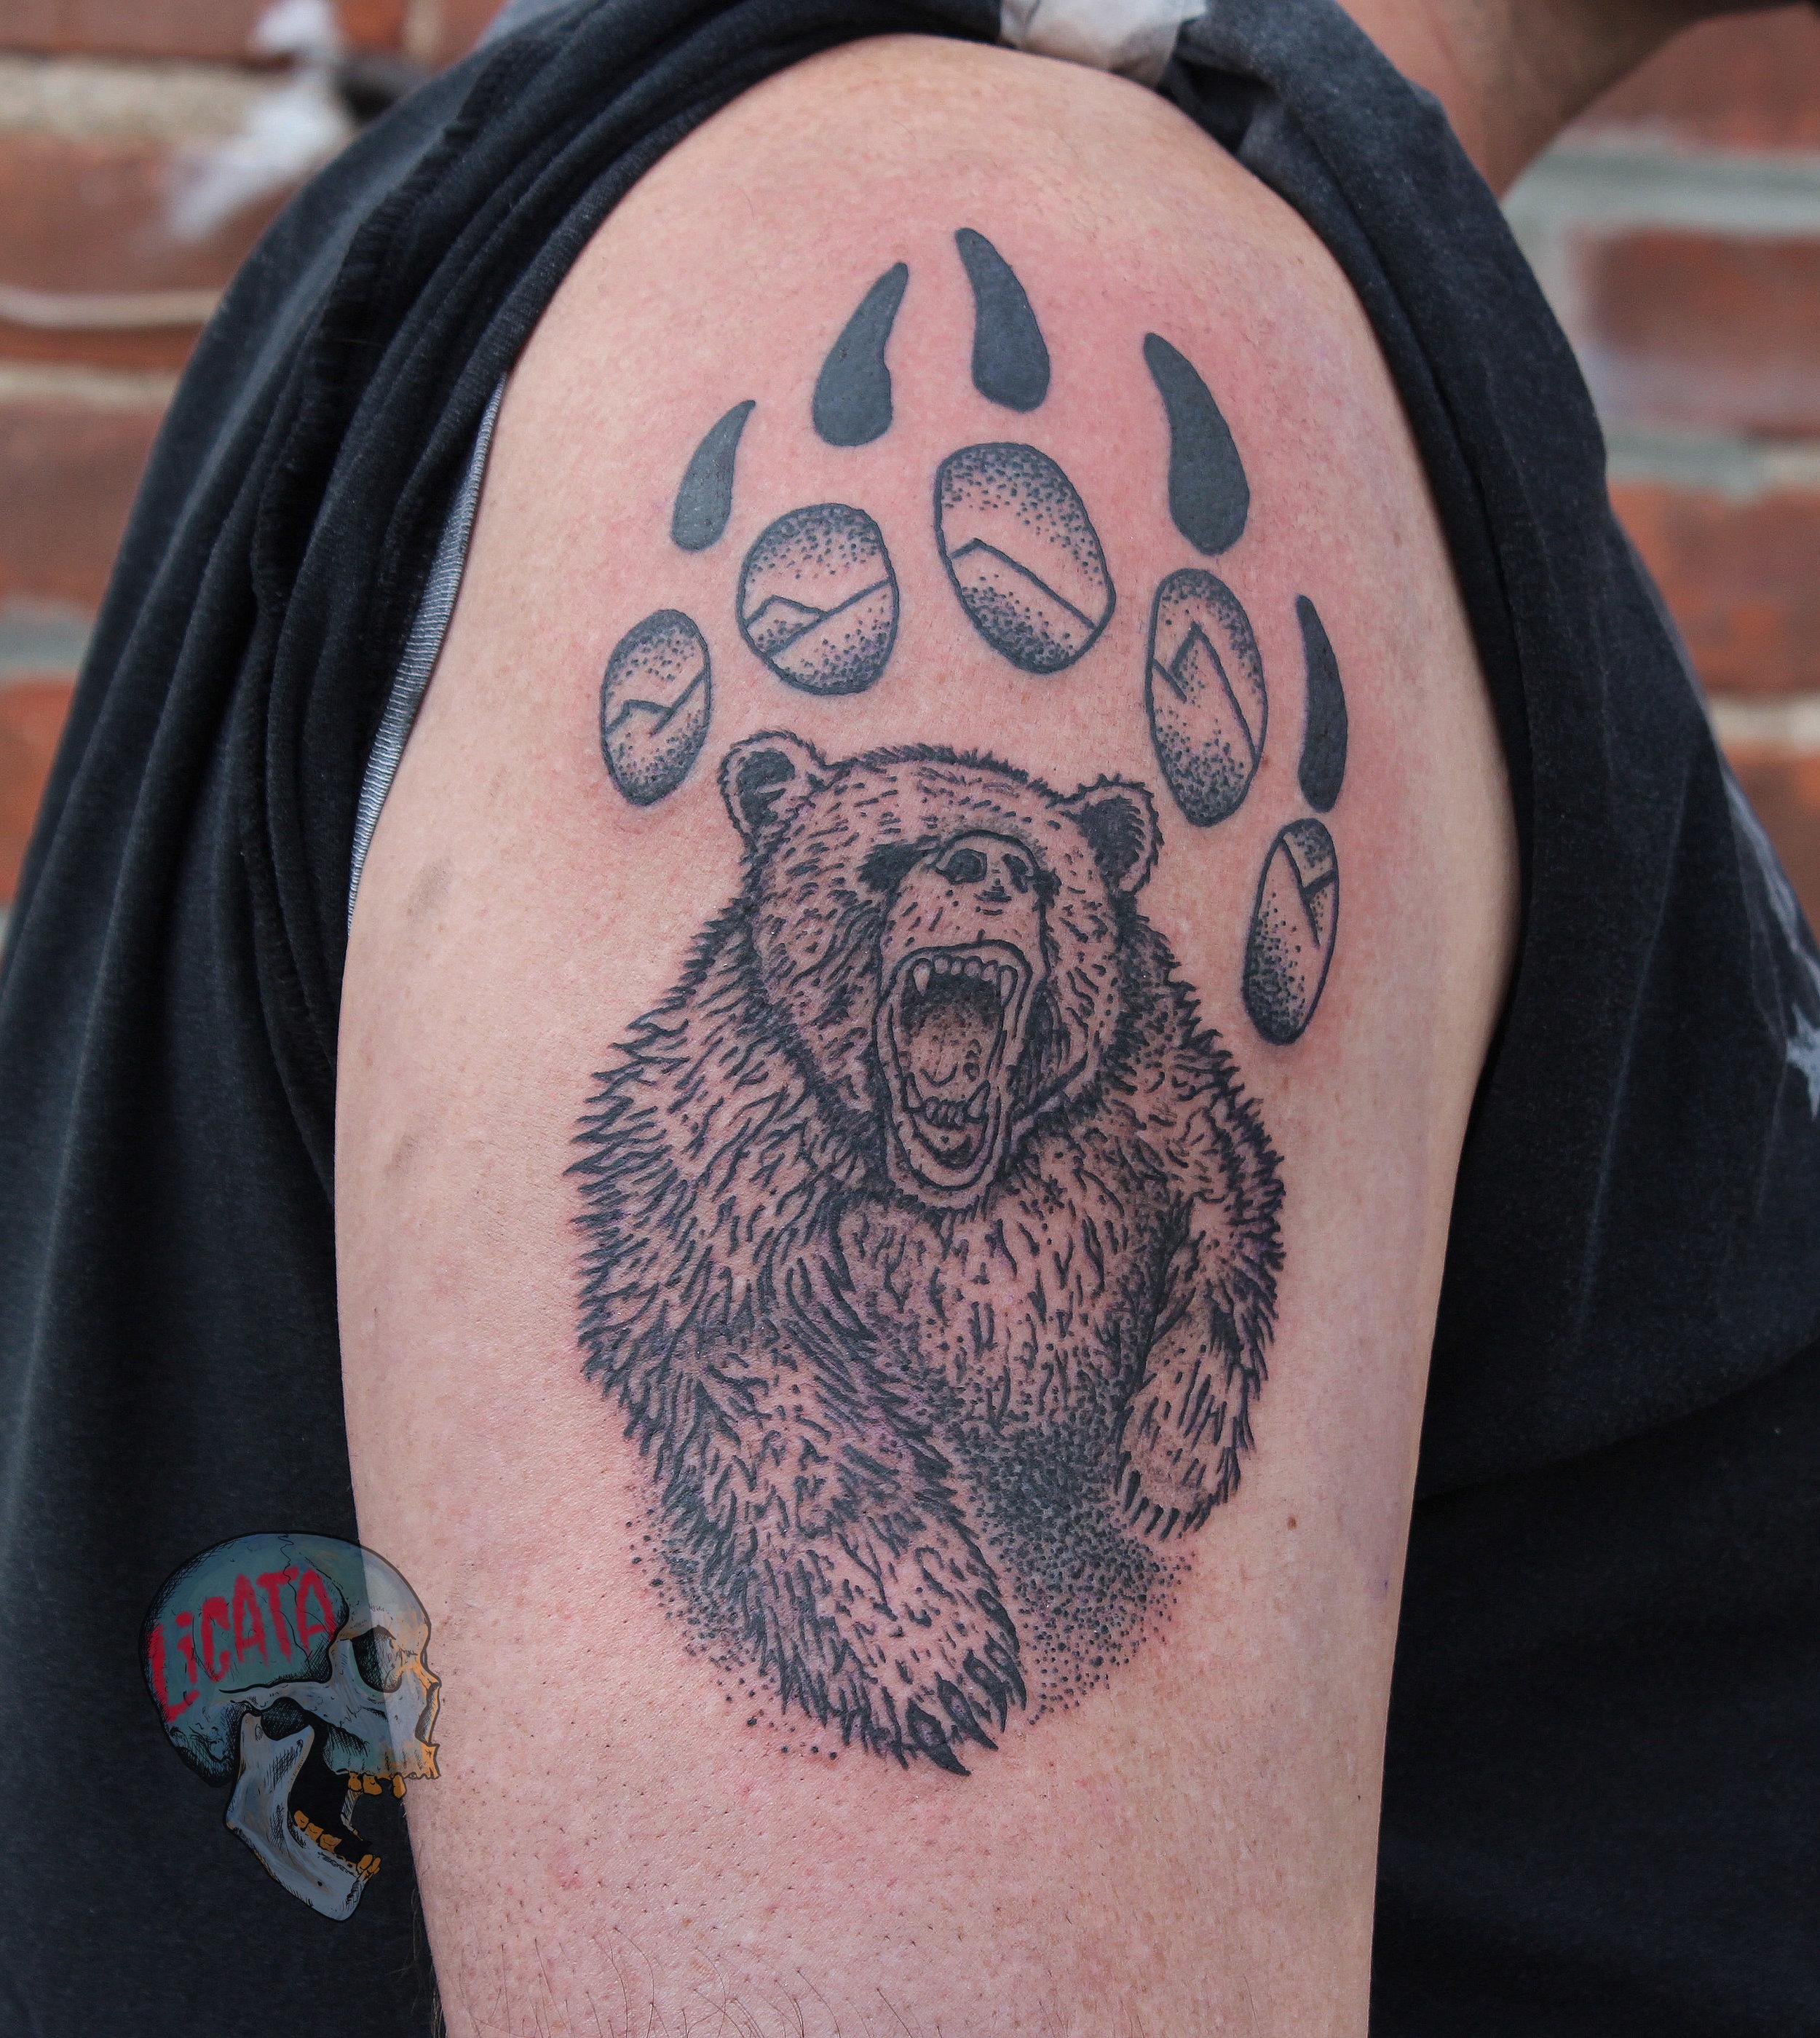 Bear Paw Tattoo on Shoulder